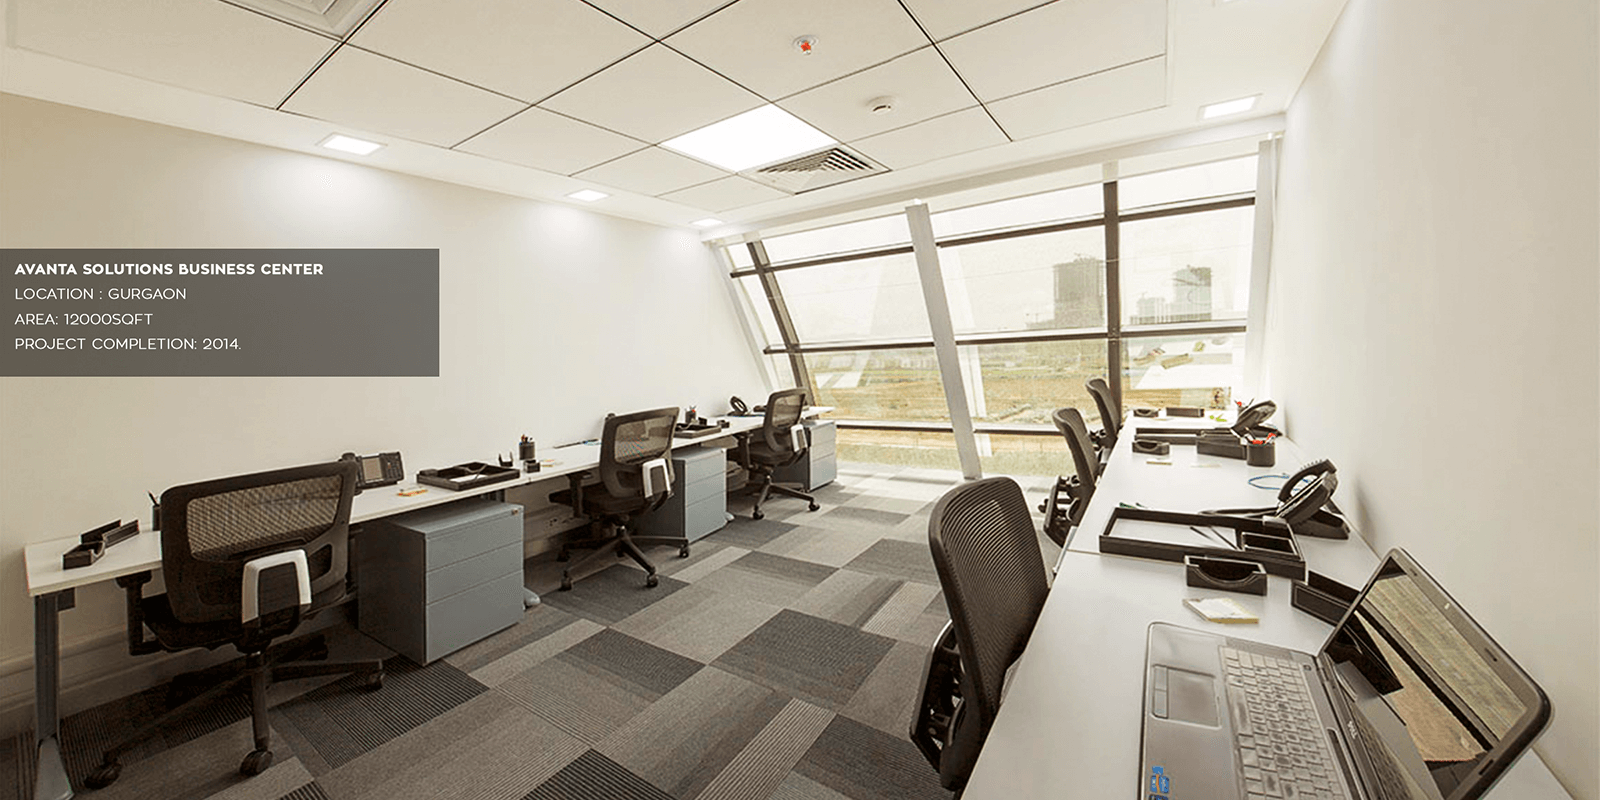 avanta-business-centre1-the-novarch-architects-best-architects-in-cr-park-south-delhi-110019